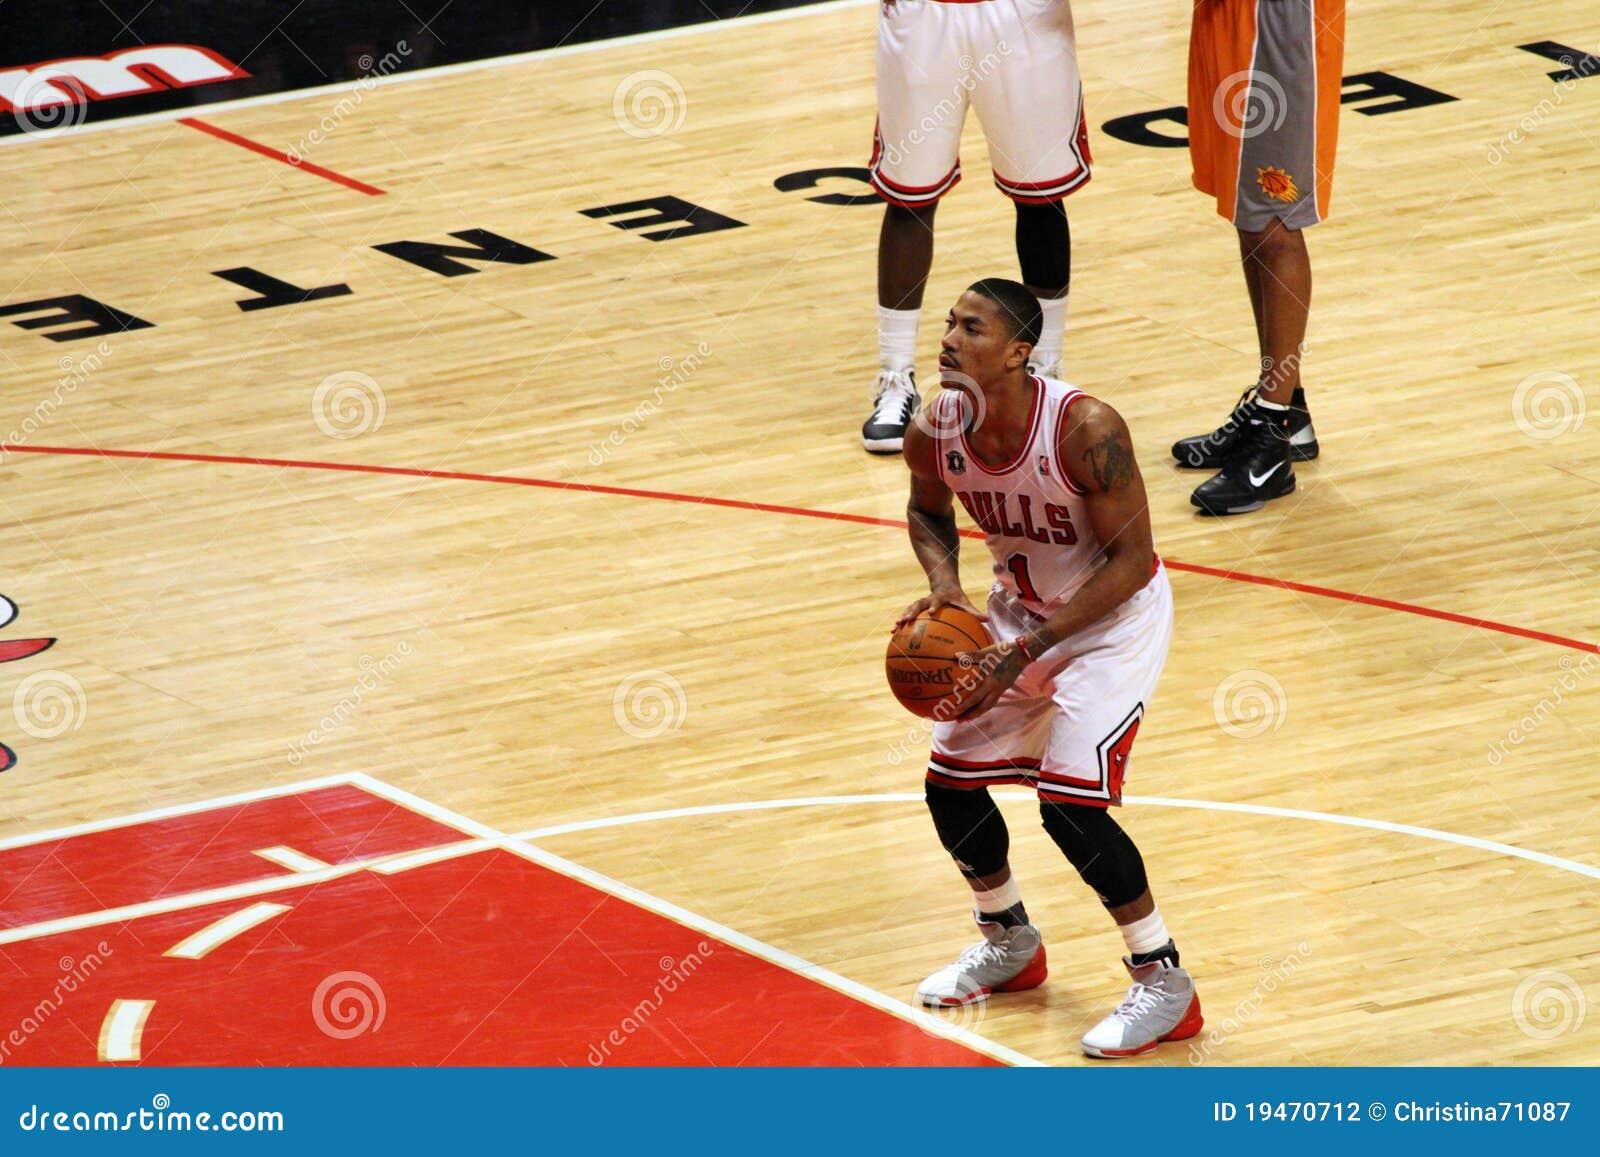 3a899e0576c Chicago Bulls MVP Rose Shoots A Free Throw Editorial Photography ...